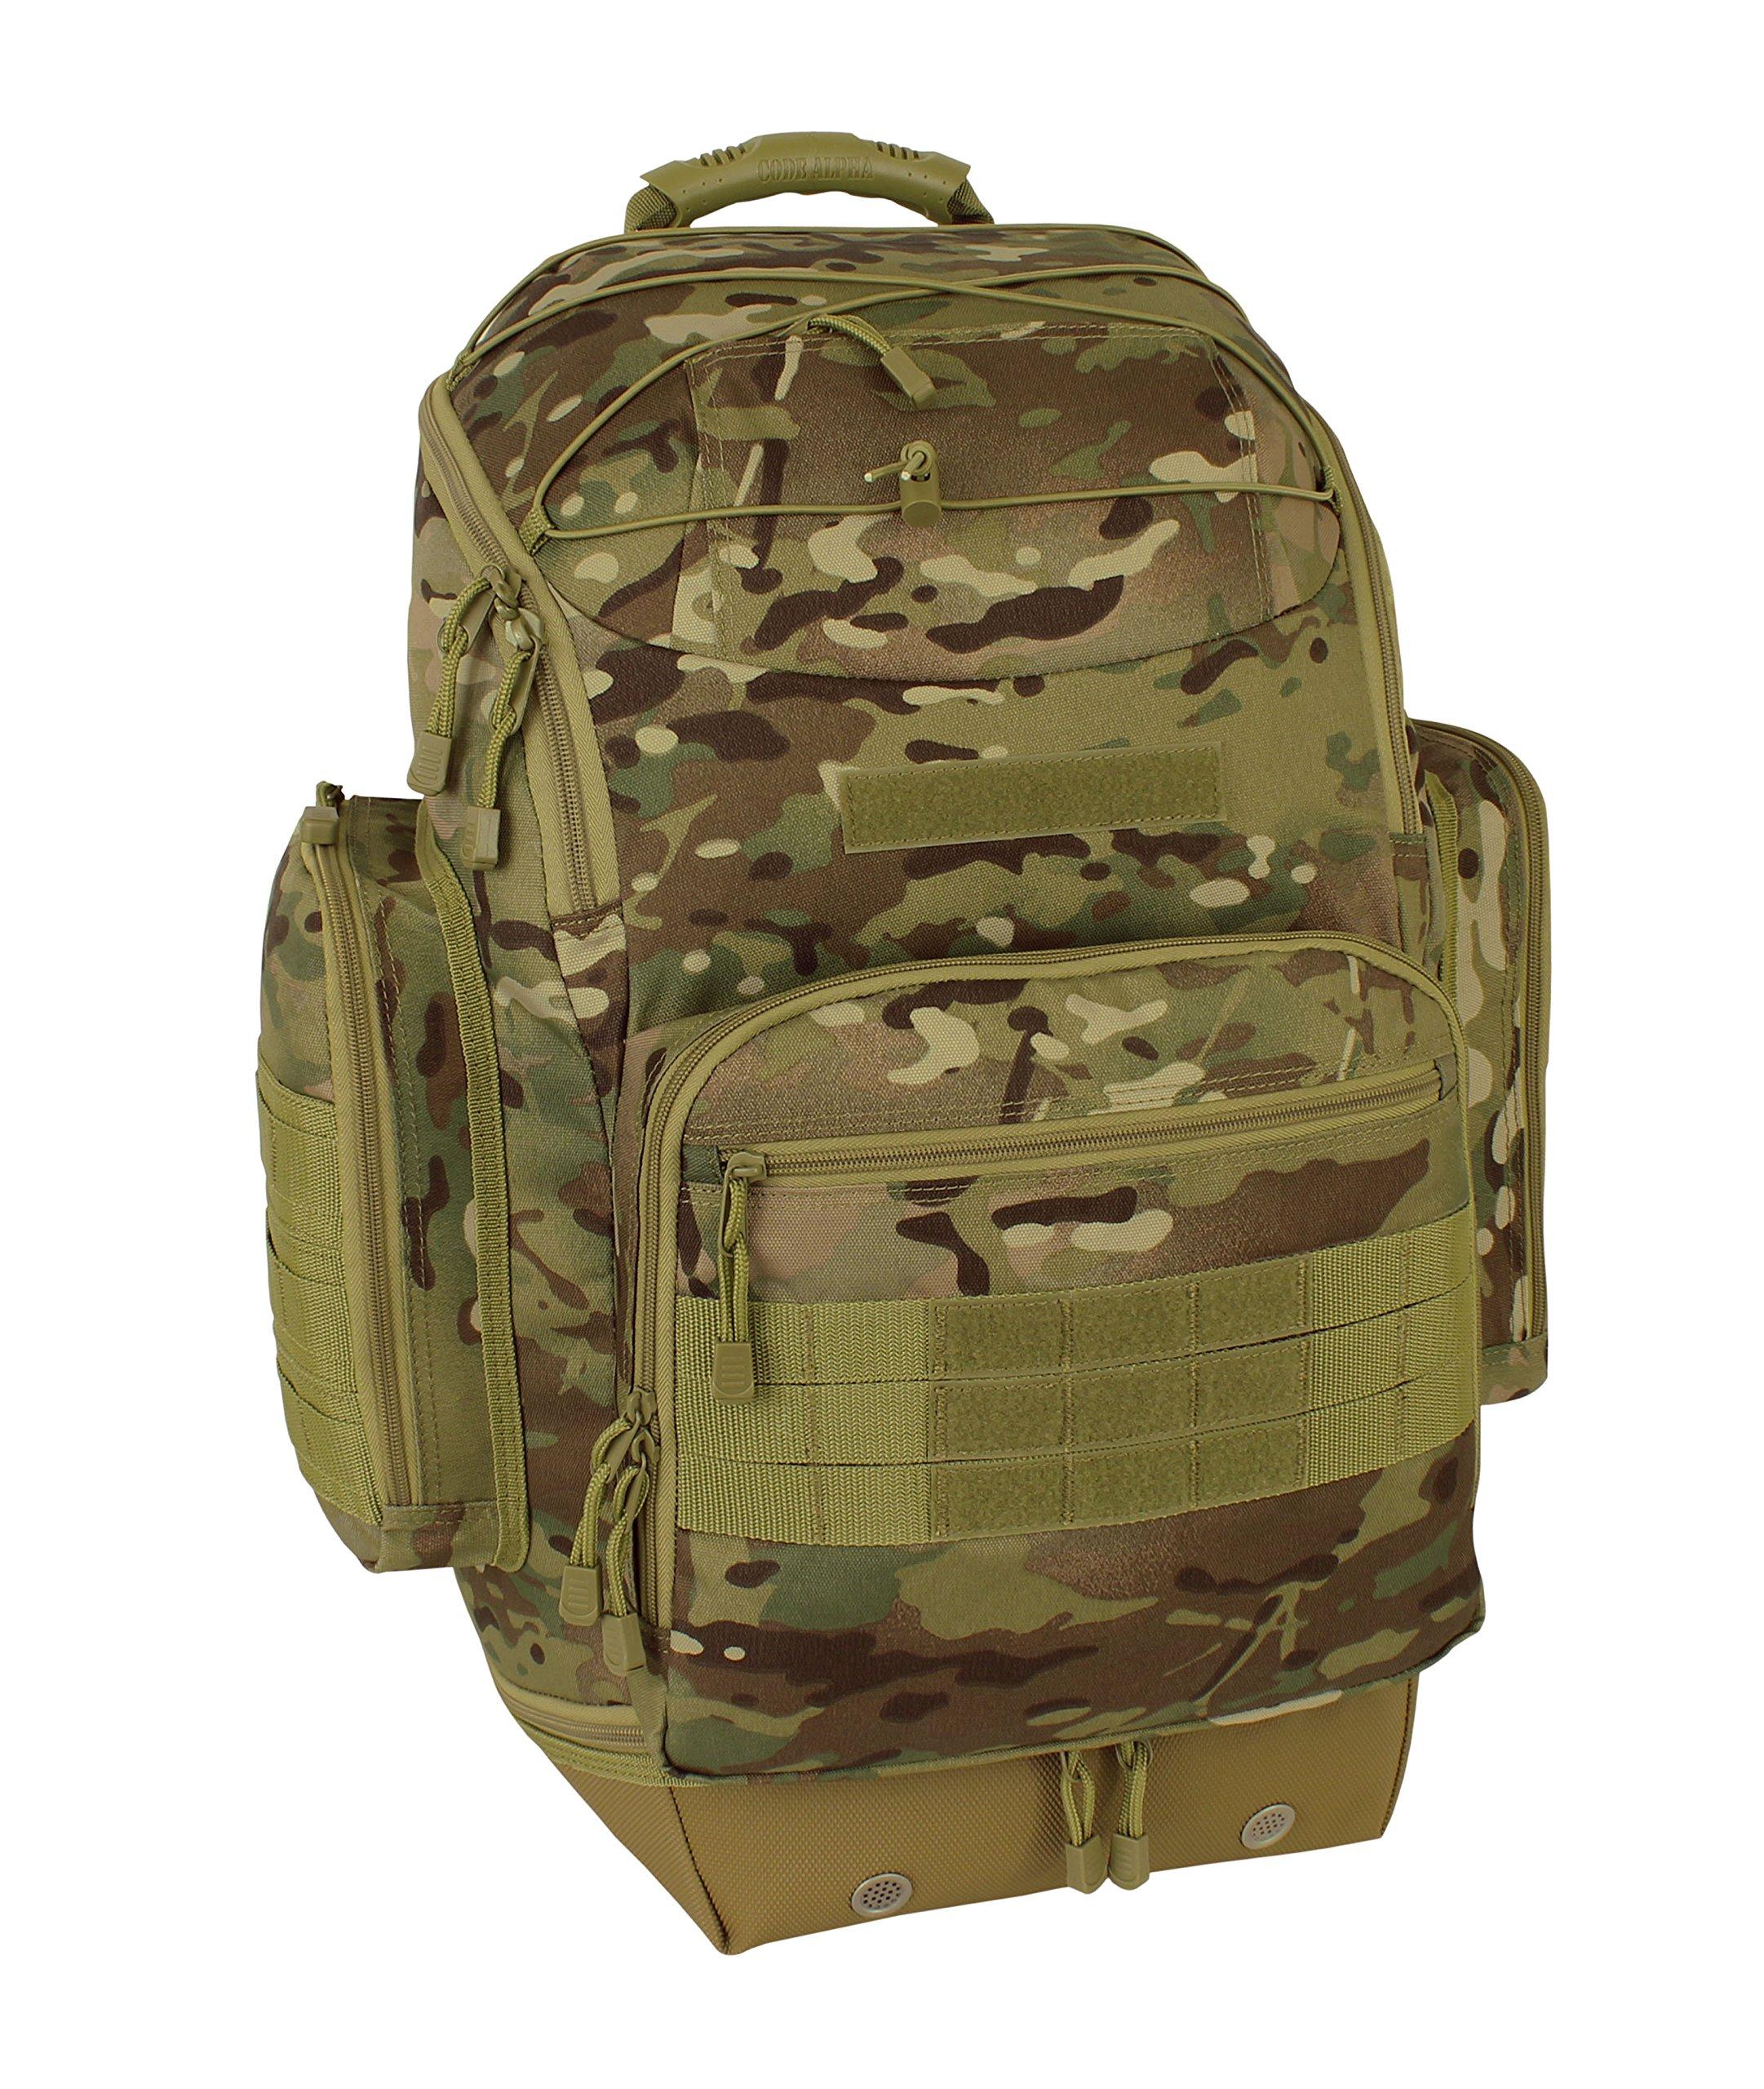 Code Alpha Bravo Zulu Pac Operator's Backpack, Multicam by Code Alpha